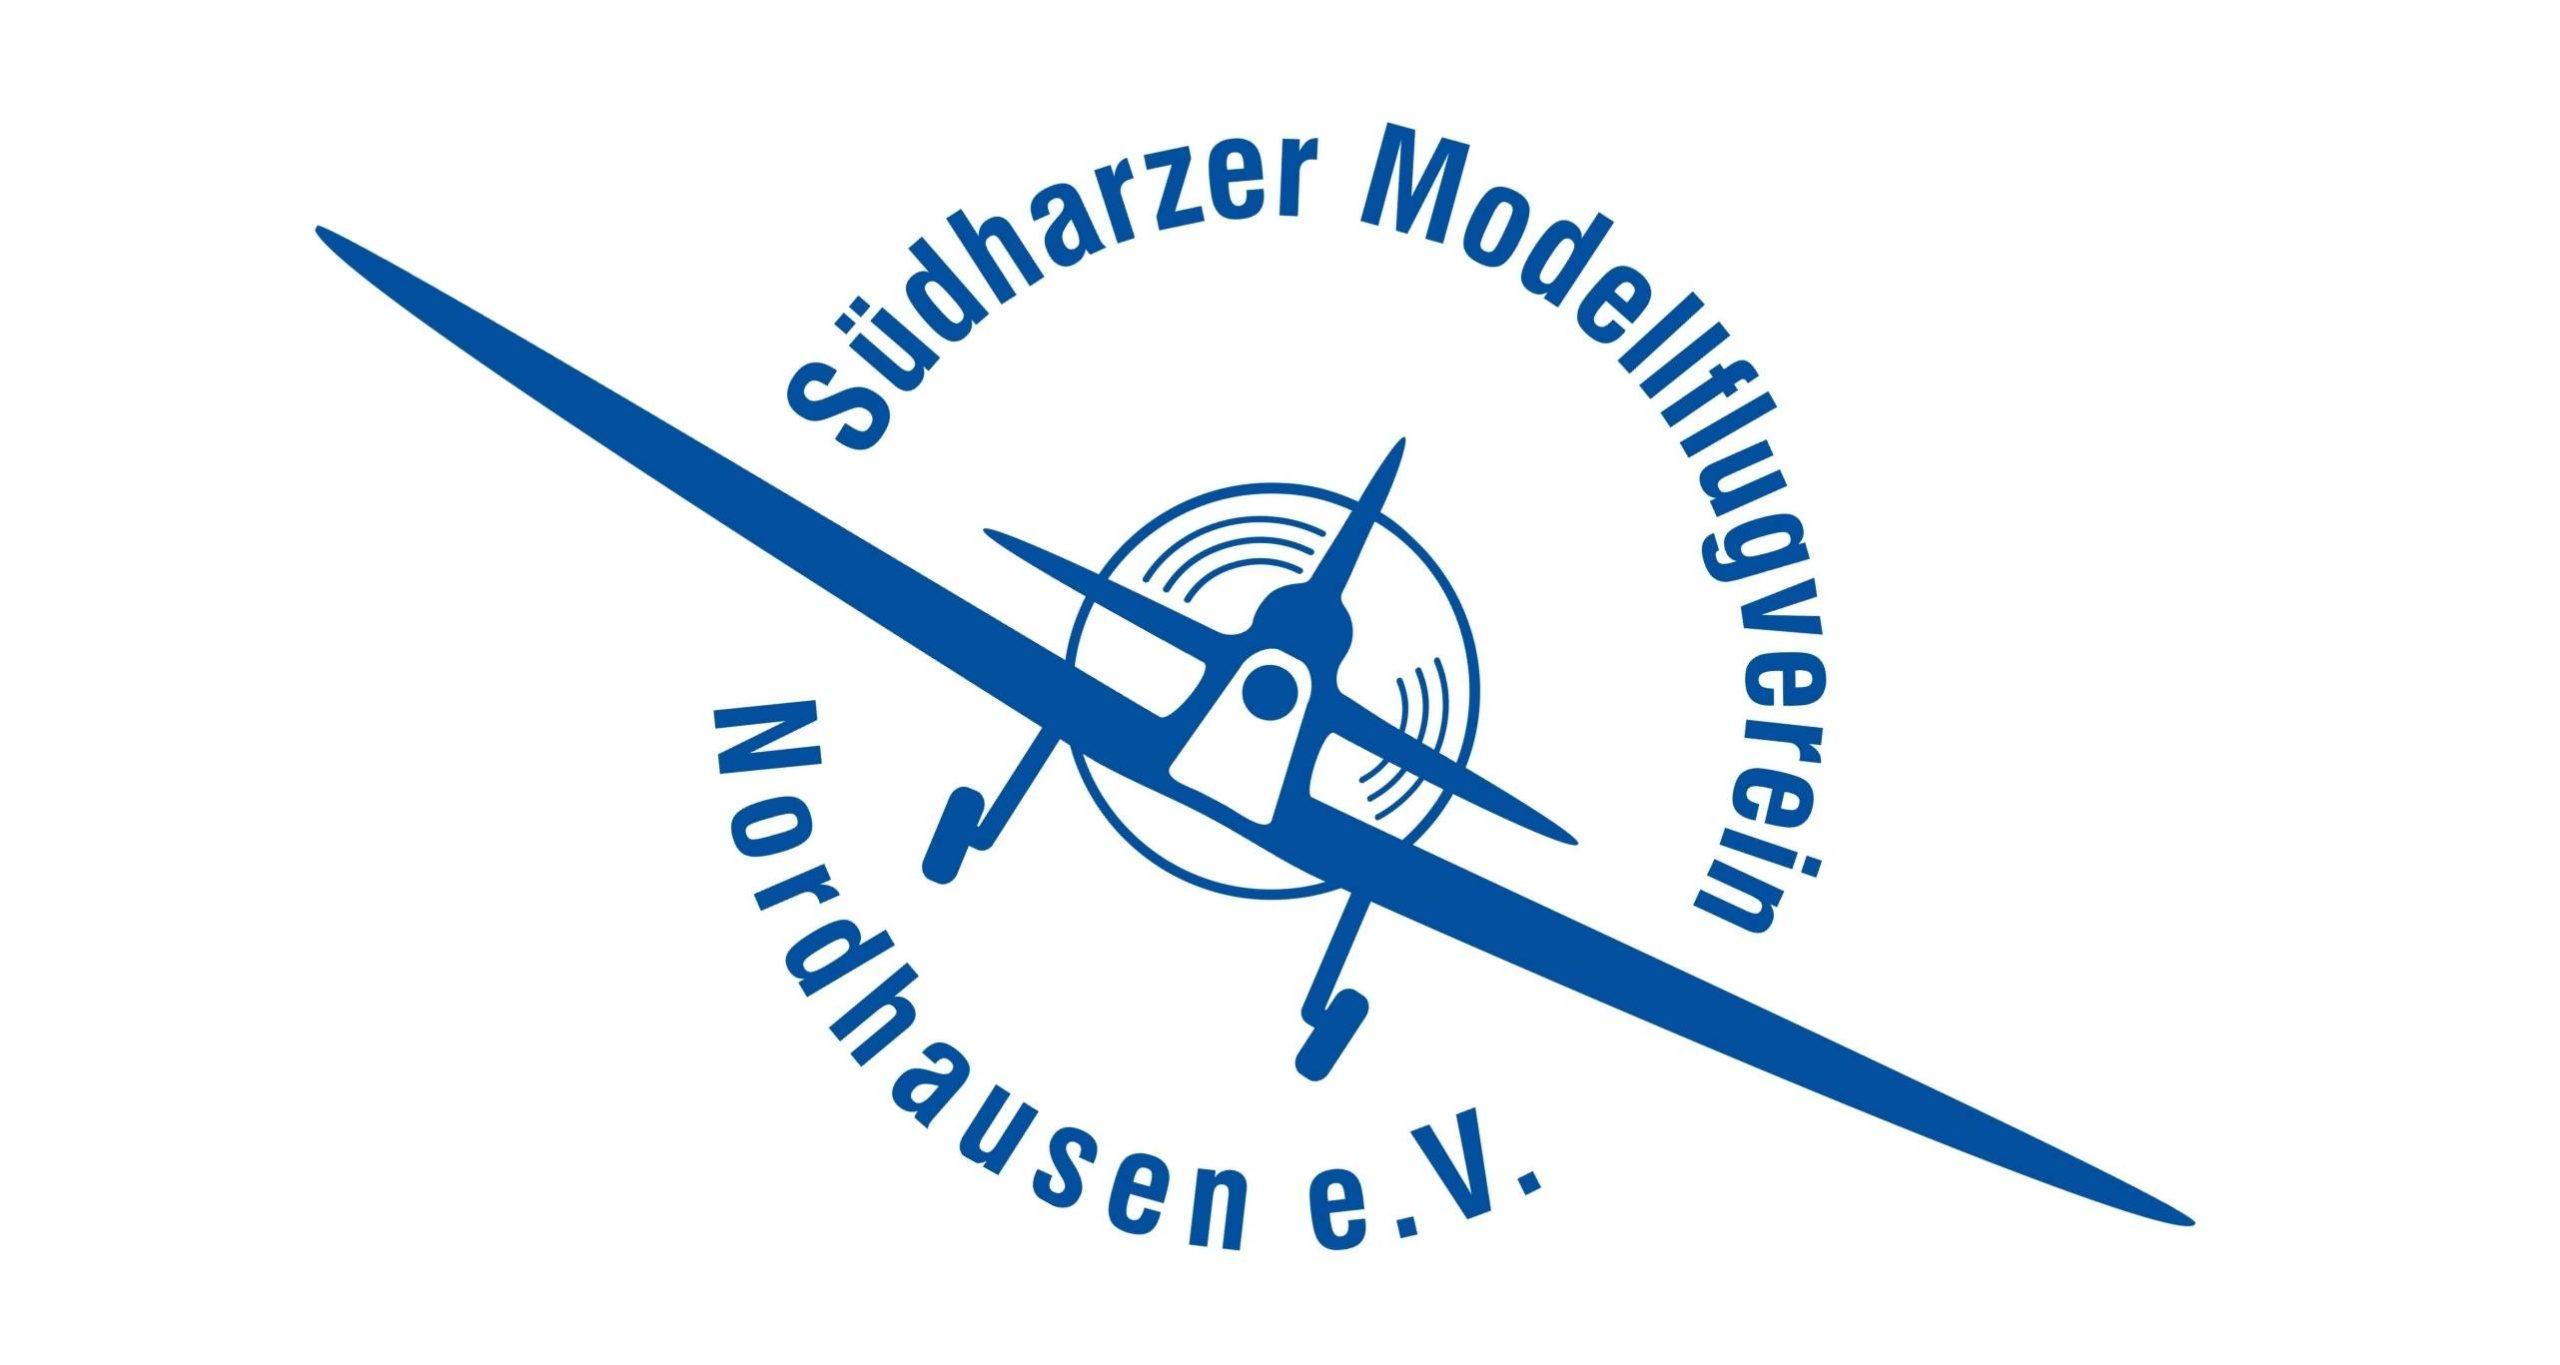 modellflug-nordhausen.de